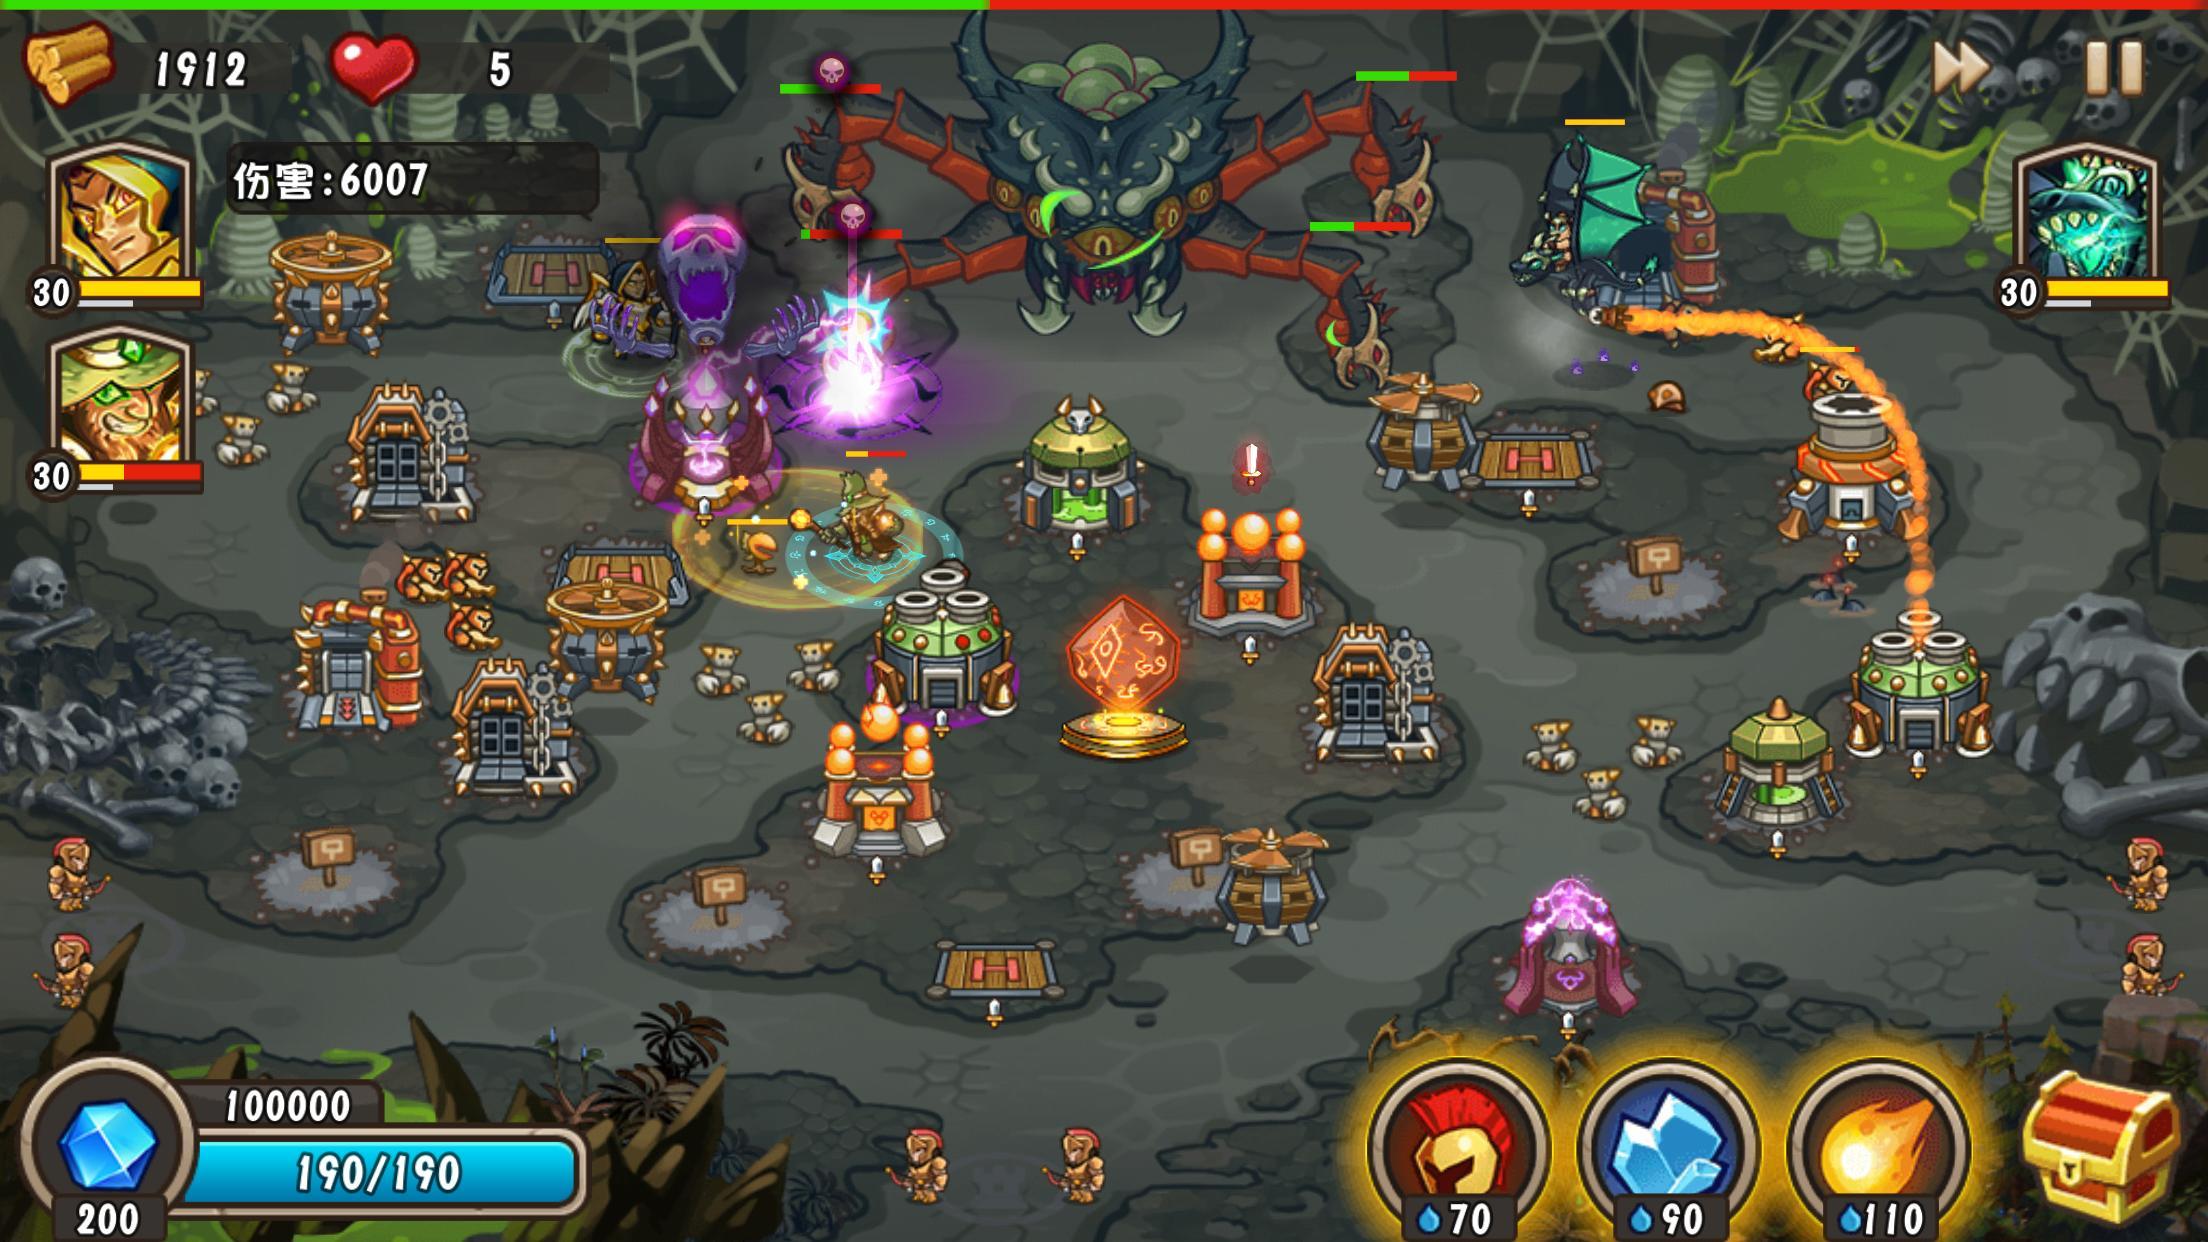 игра Castle Defense для андроид